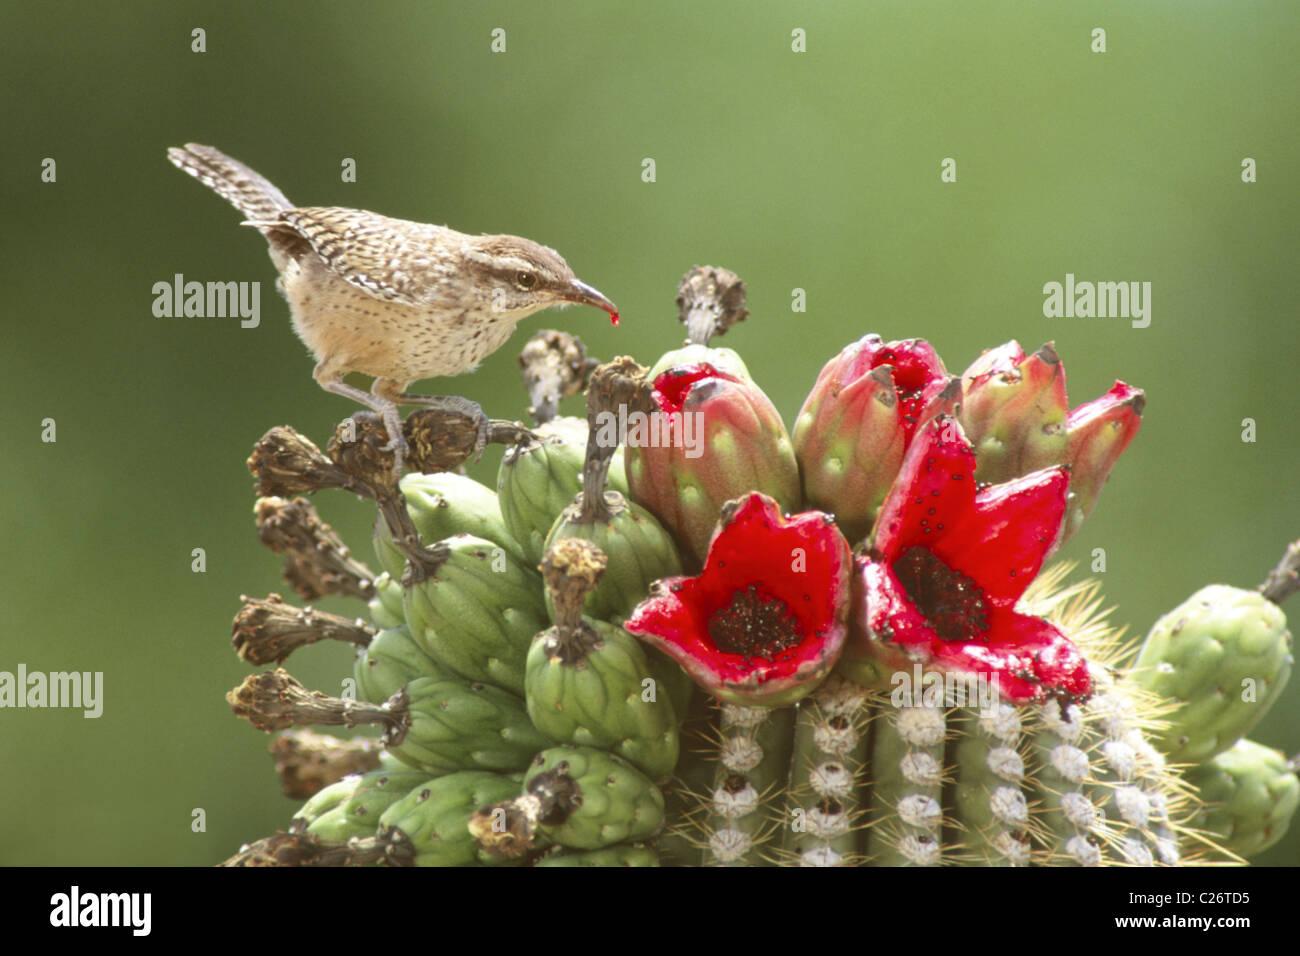 Cactus Wren Feeding on Sagaro Cactus Fruit - Stock Image